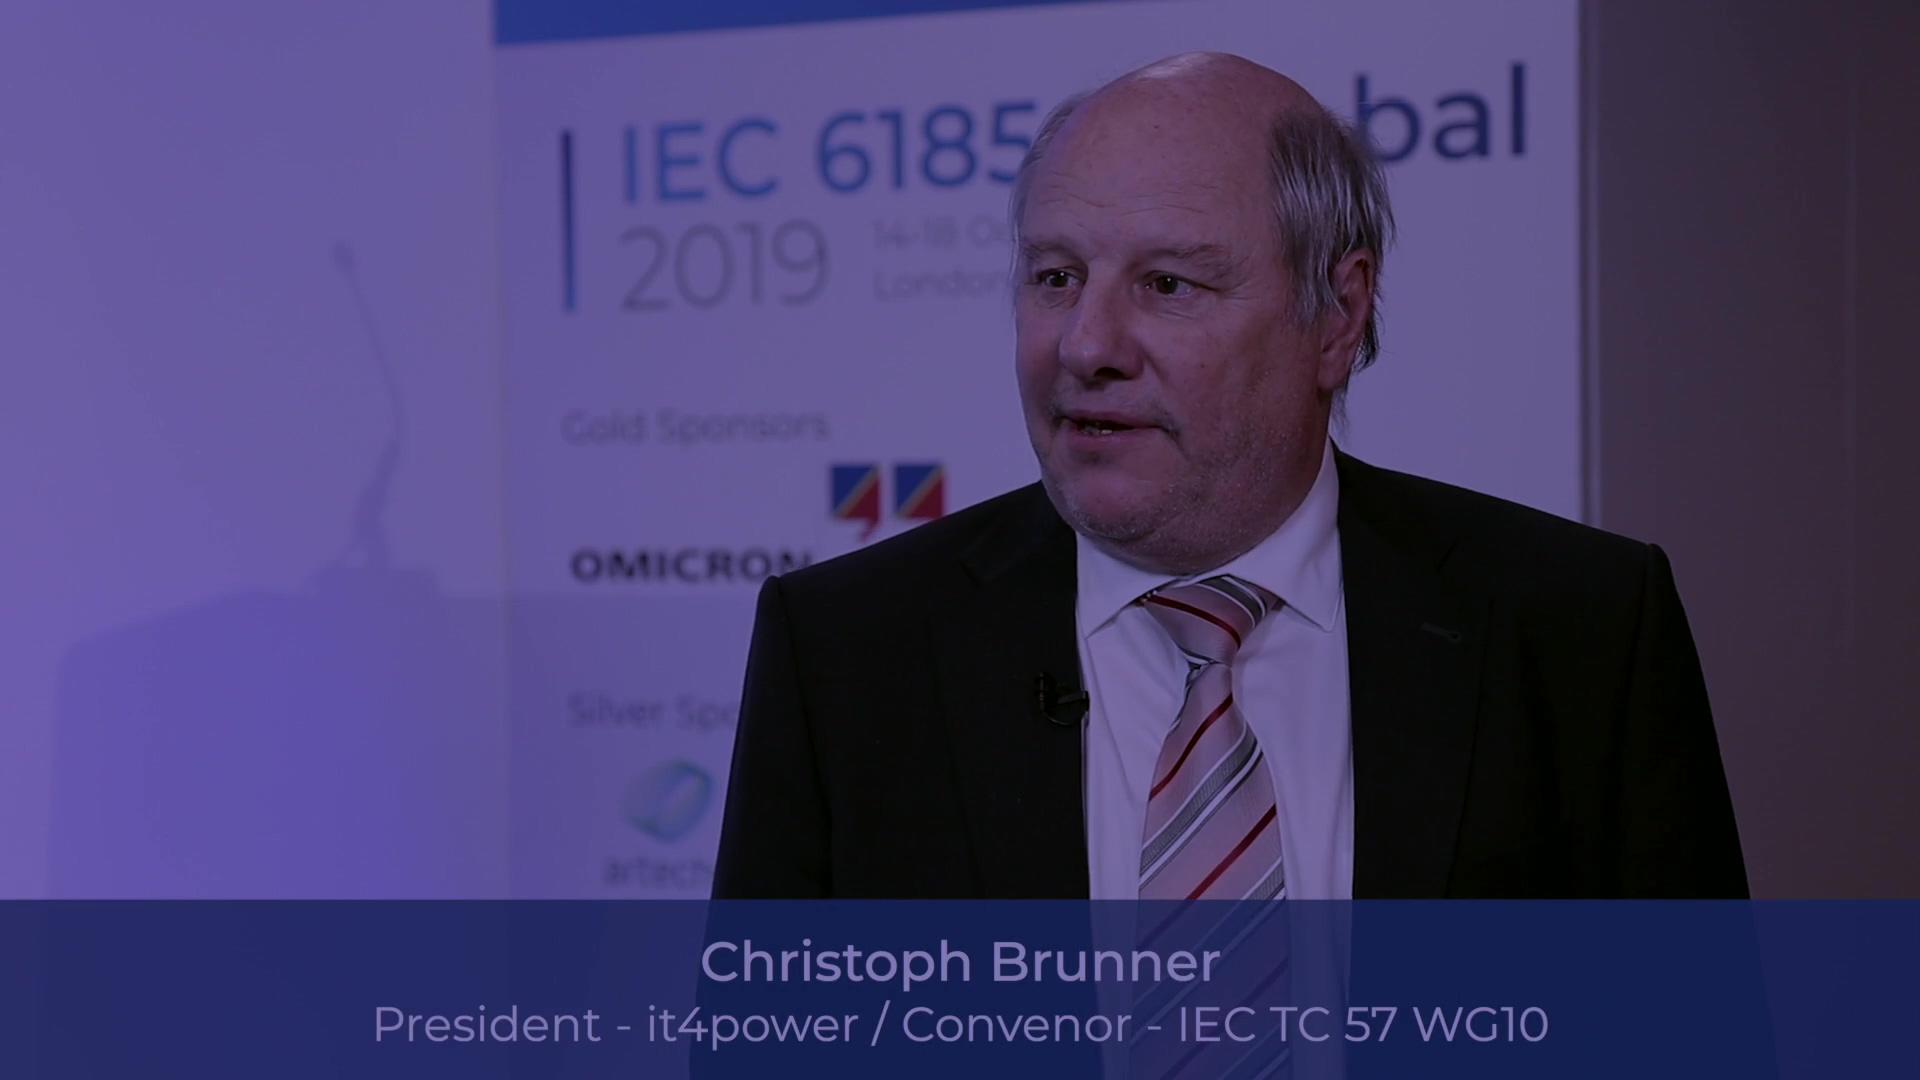 IEC 61850 Global 2019 Highlights EDIT